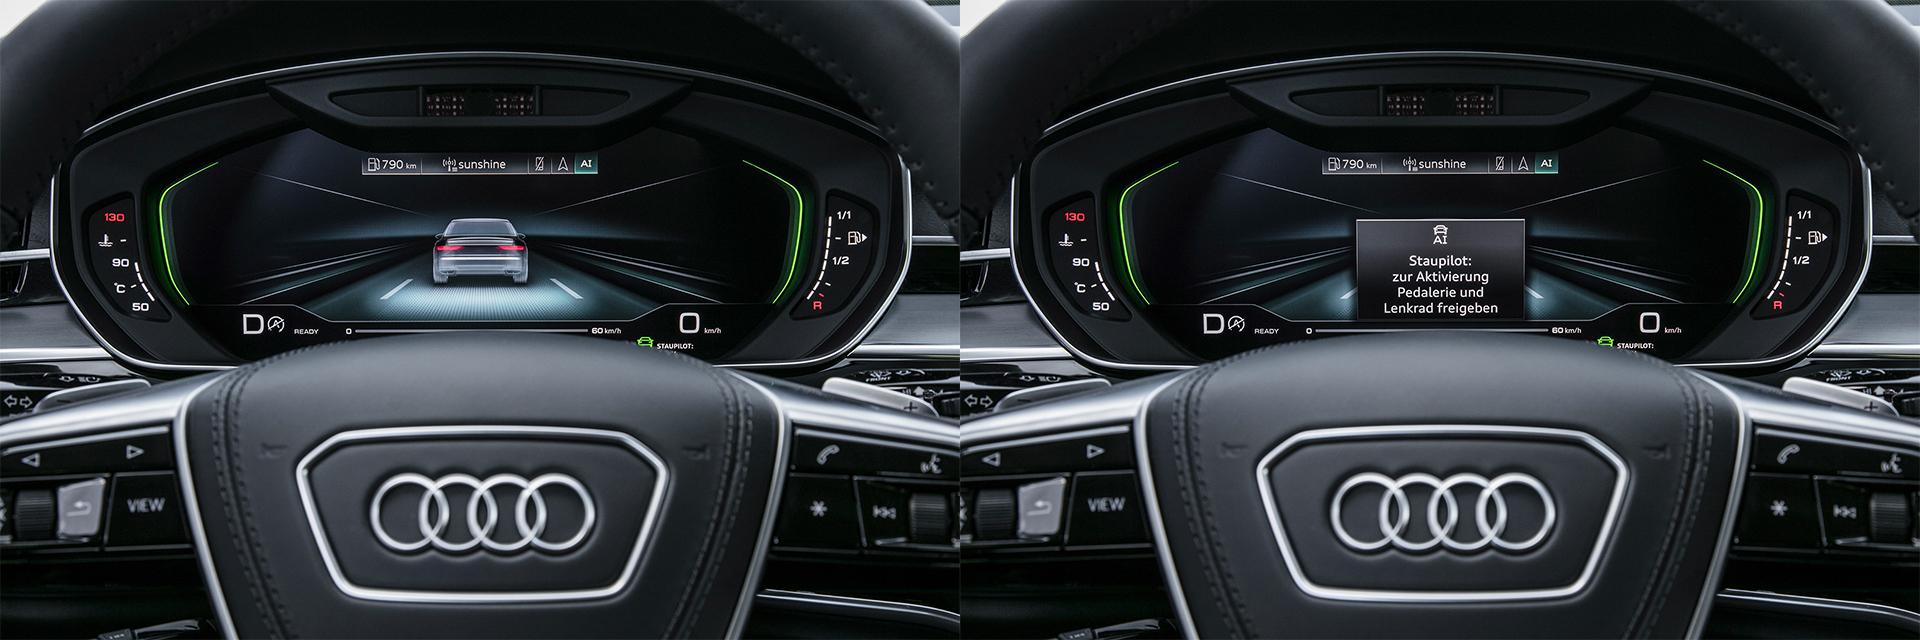 Ассистент движения в условиях пробок Audi AI traffic jam pilot_5